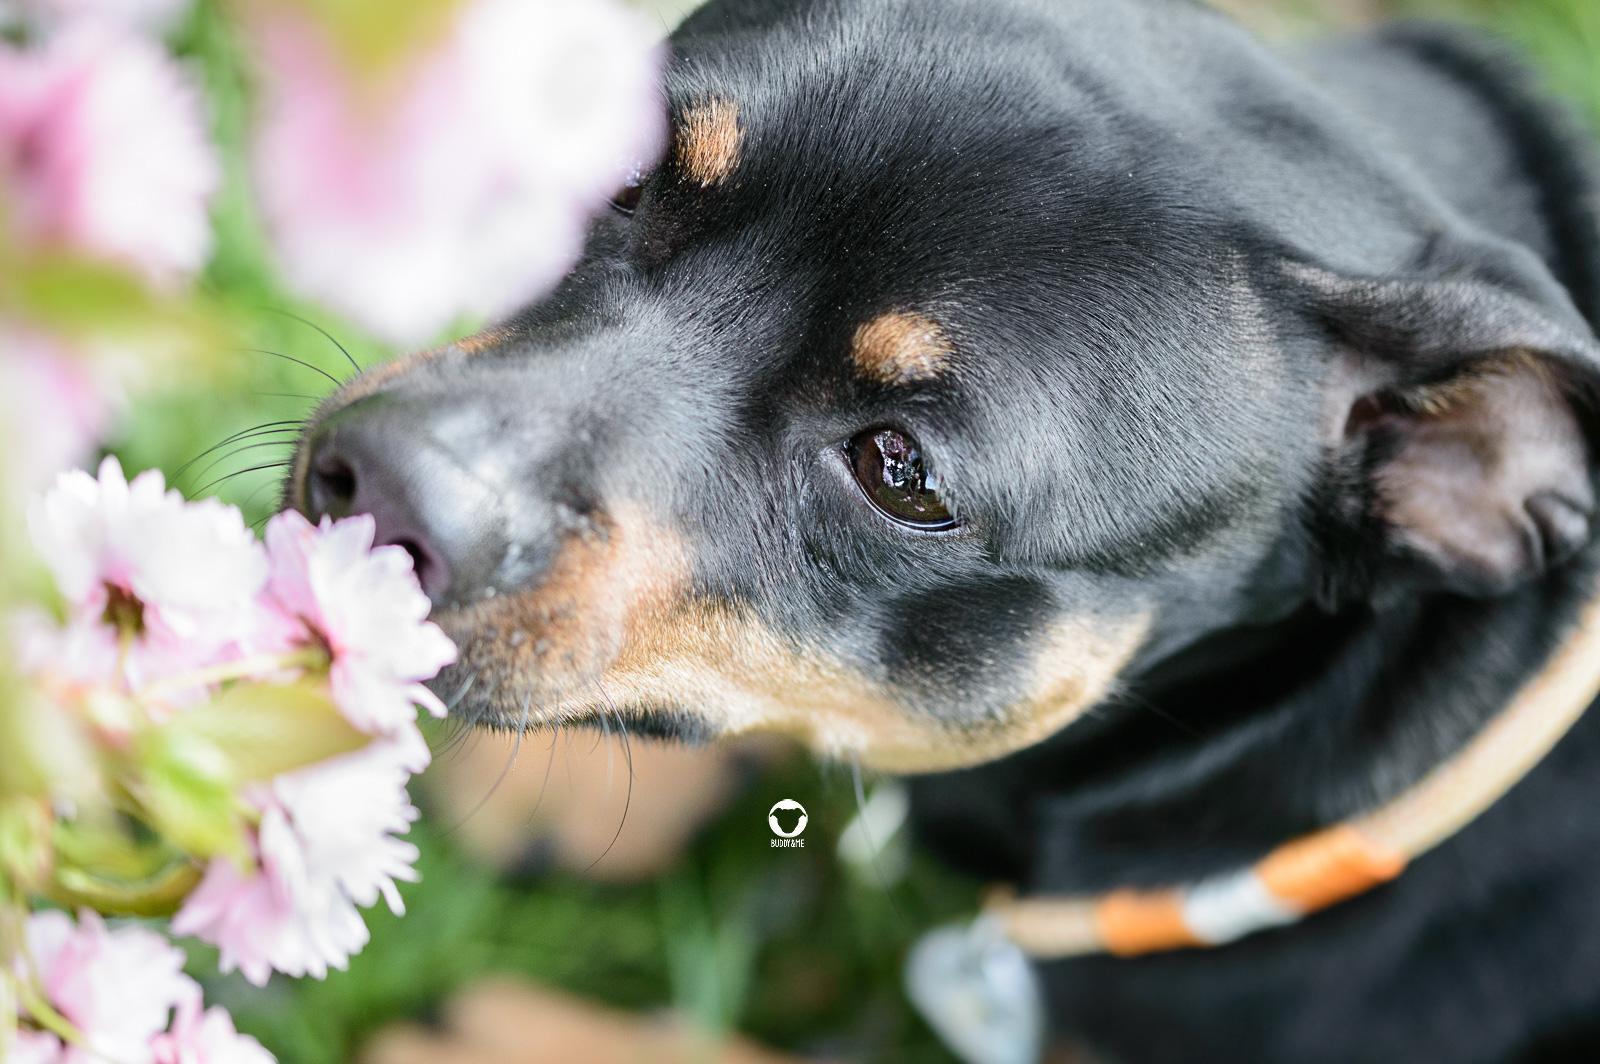 Pinscher Buddy, Buddy and Me, Hundeblog, Dogblog, Frühling, Frühlingsgefühle, Hormone, Blumen, Blüten, Schnuppern, Schnüffeln